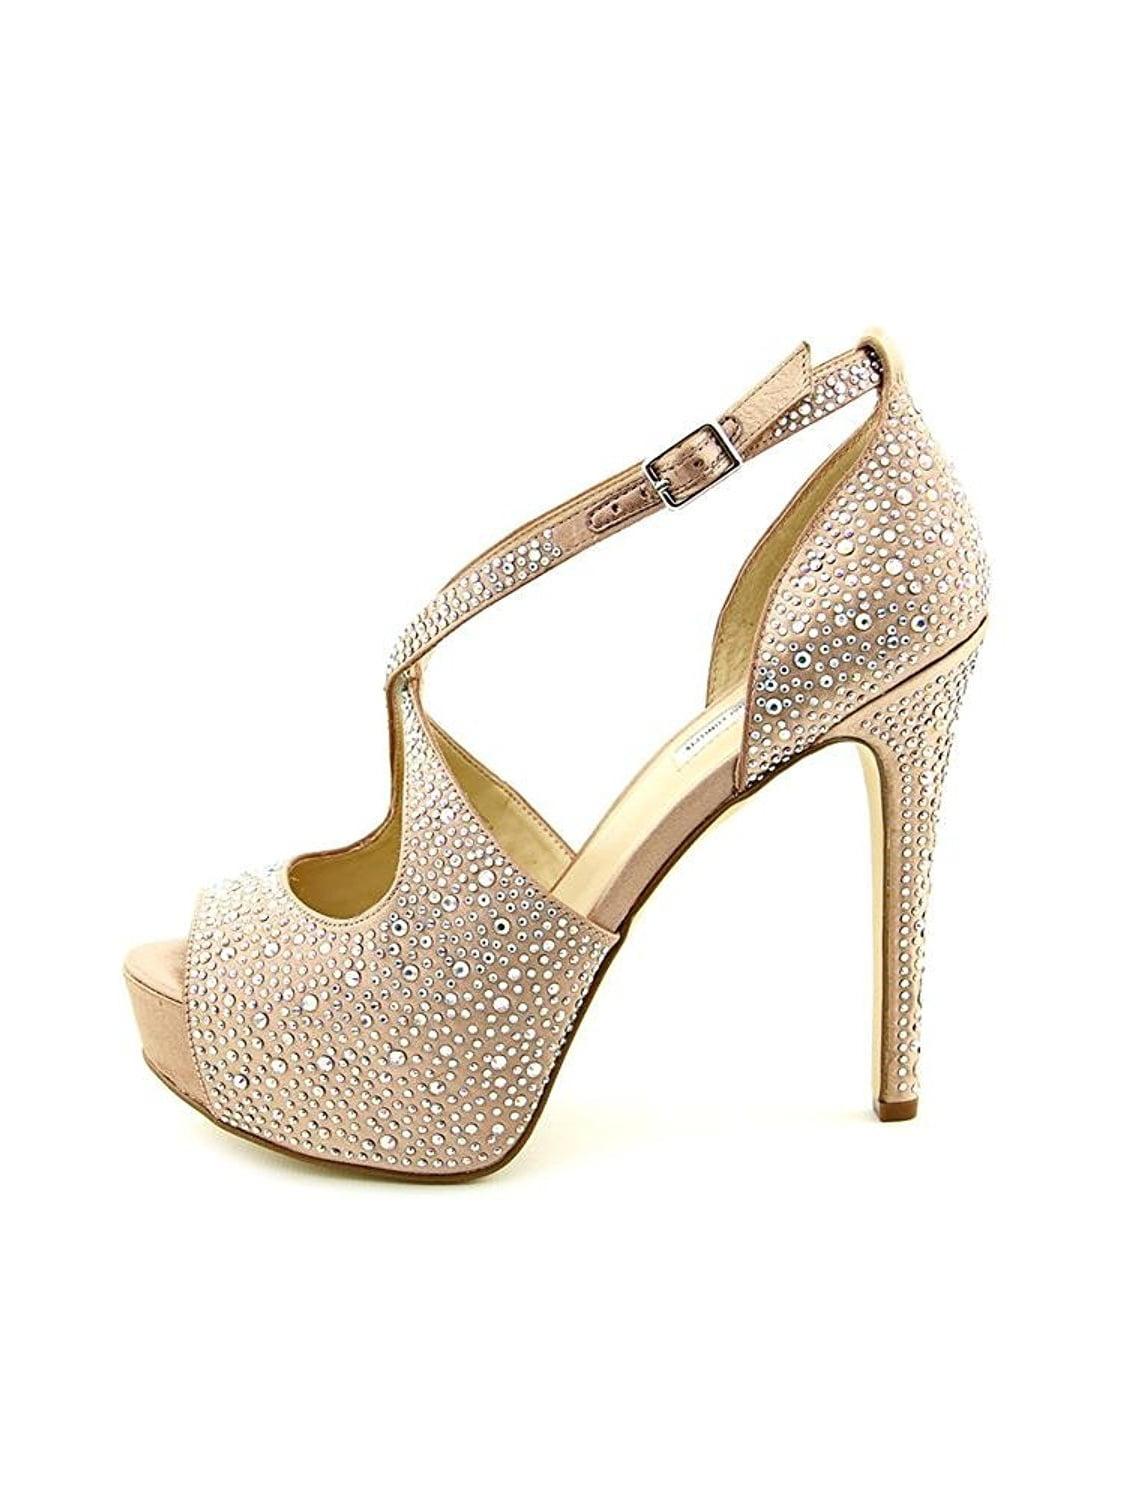 INC International Concepts Womens Melvie 2 Peep Toe Ankle Strap Platform Pumps